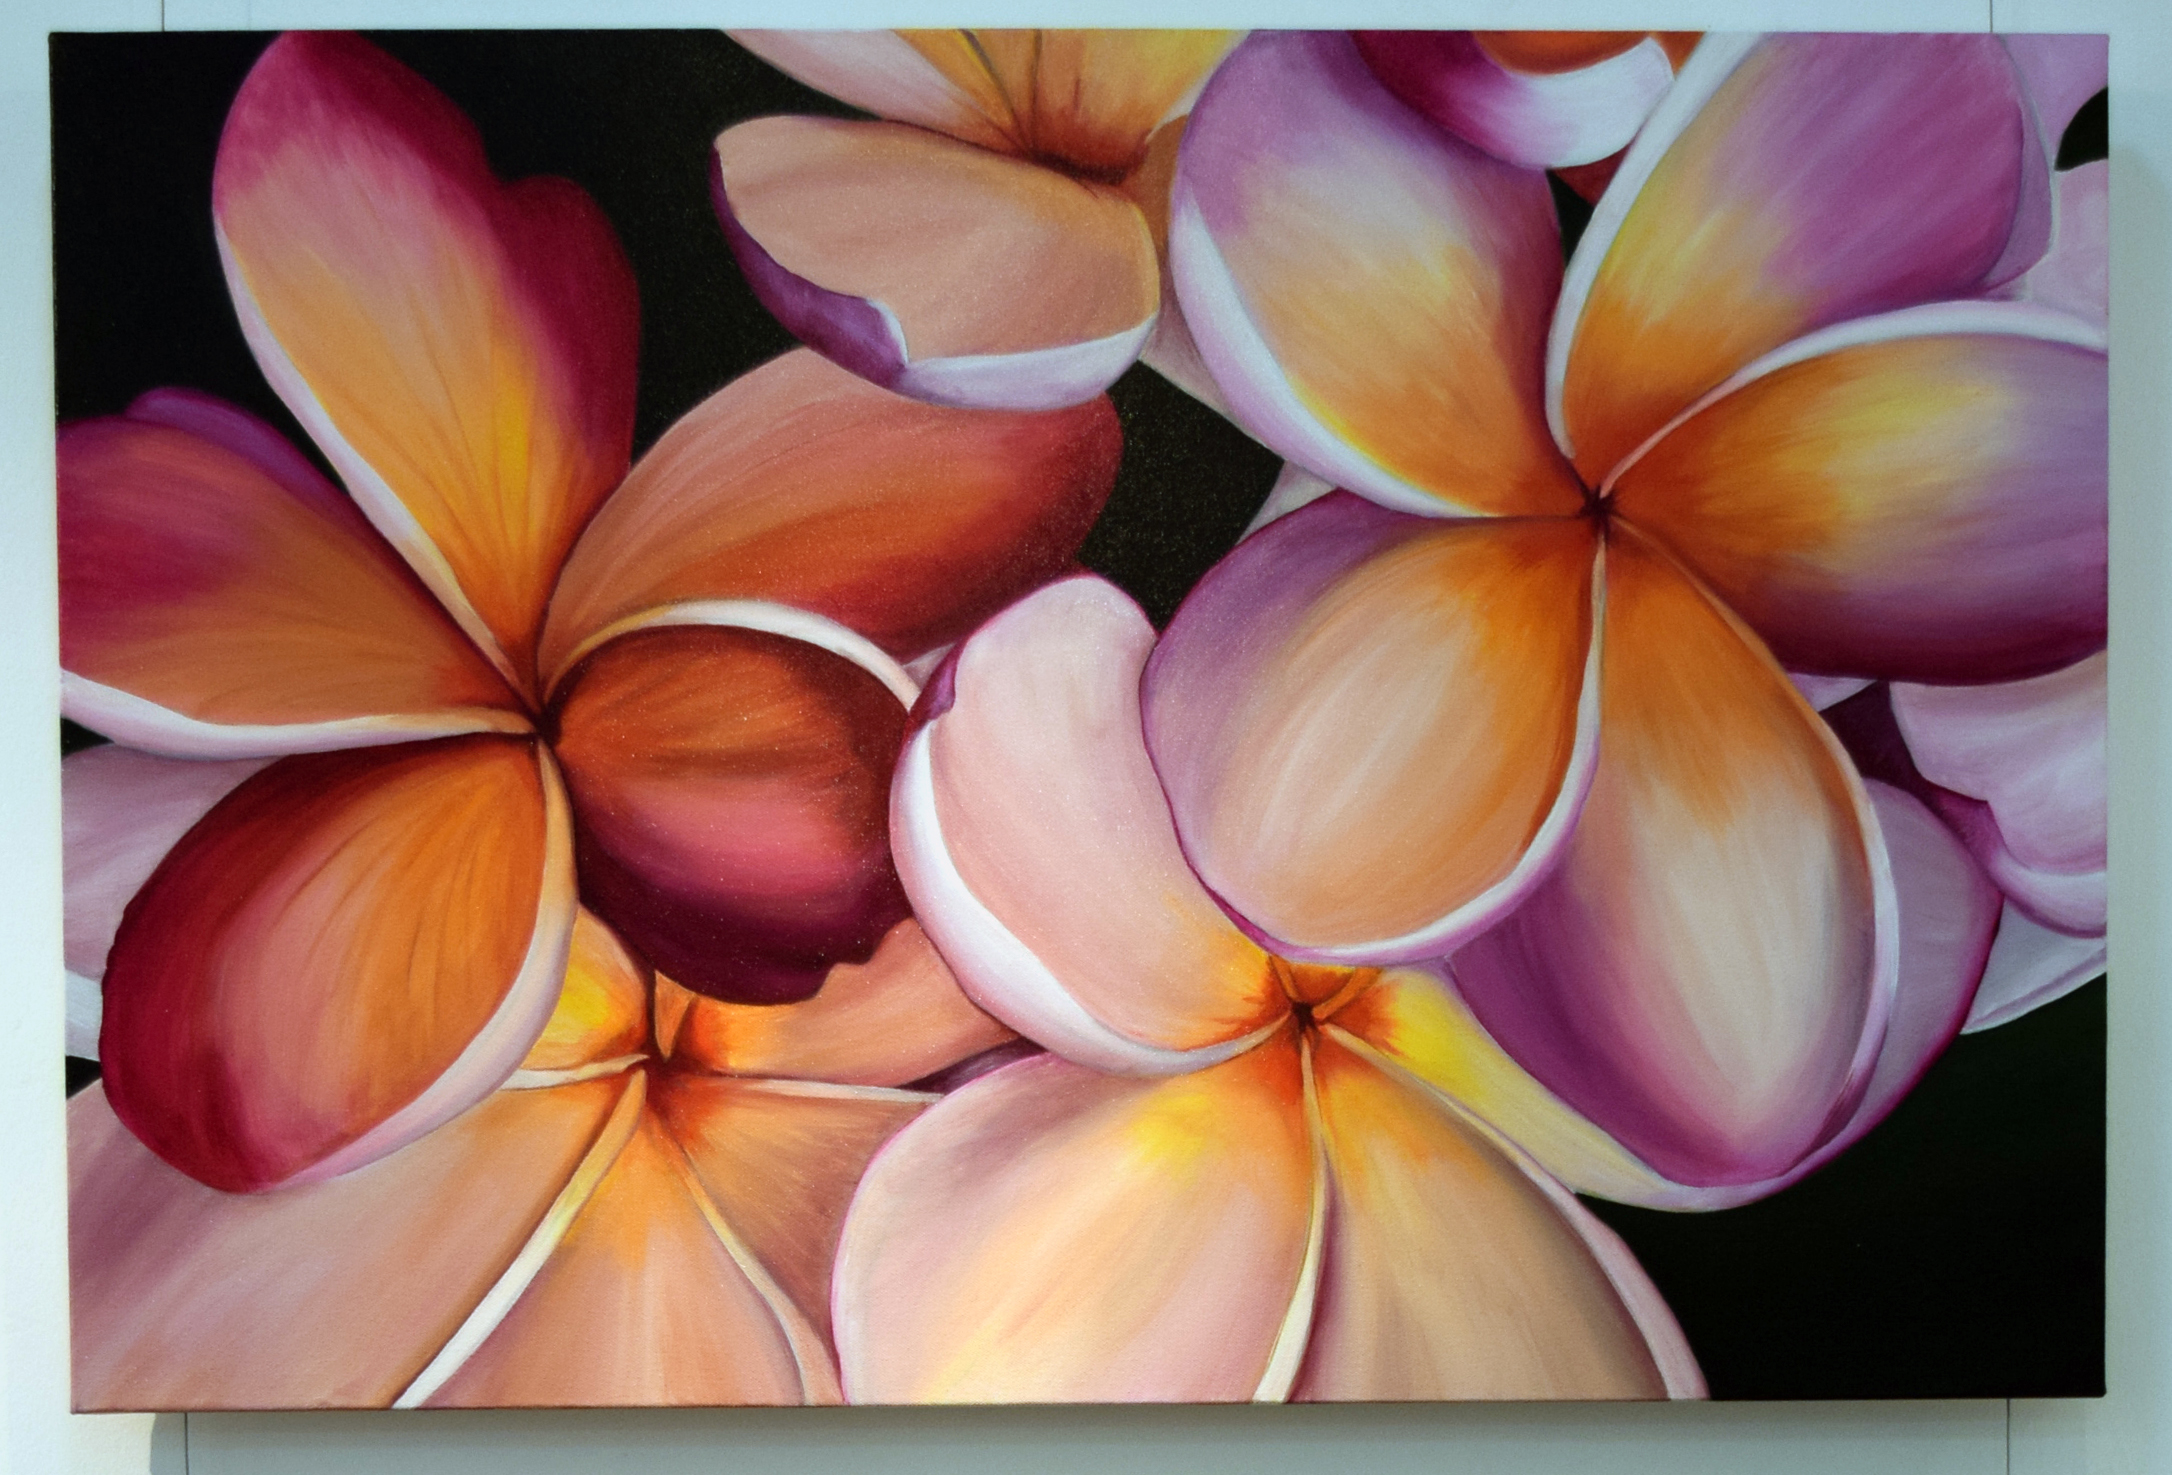 5. Hayley Krüger Gradwell, Tropical Blush, 2018, acrylic on canvas, 61x 91 cm, $850